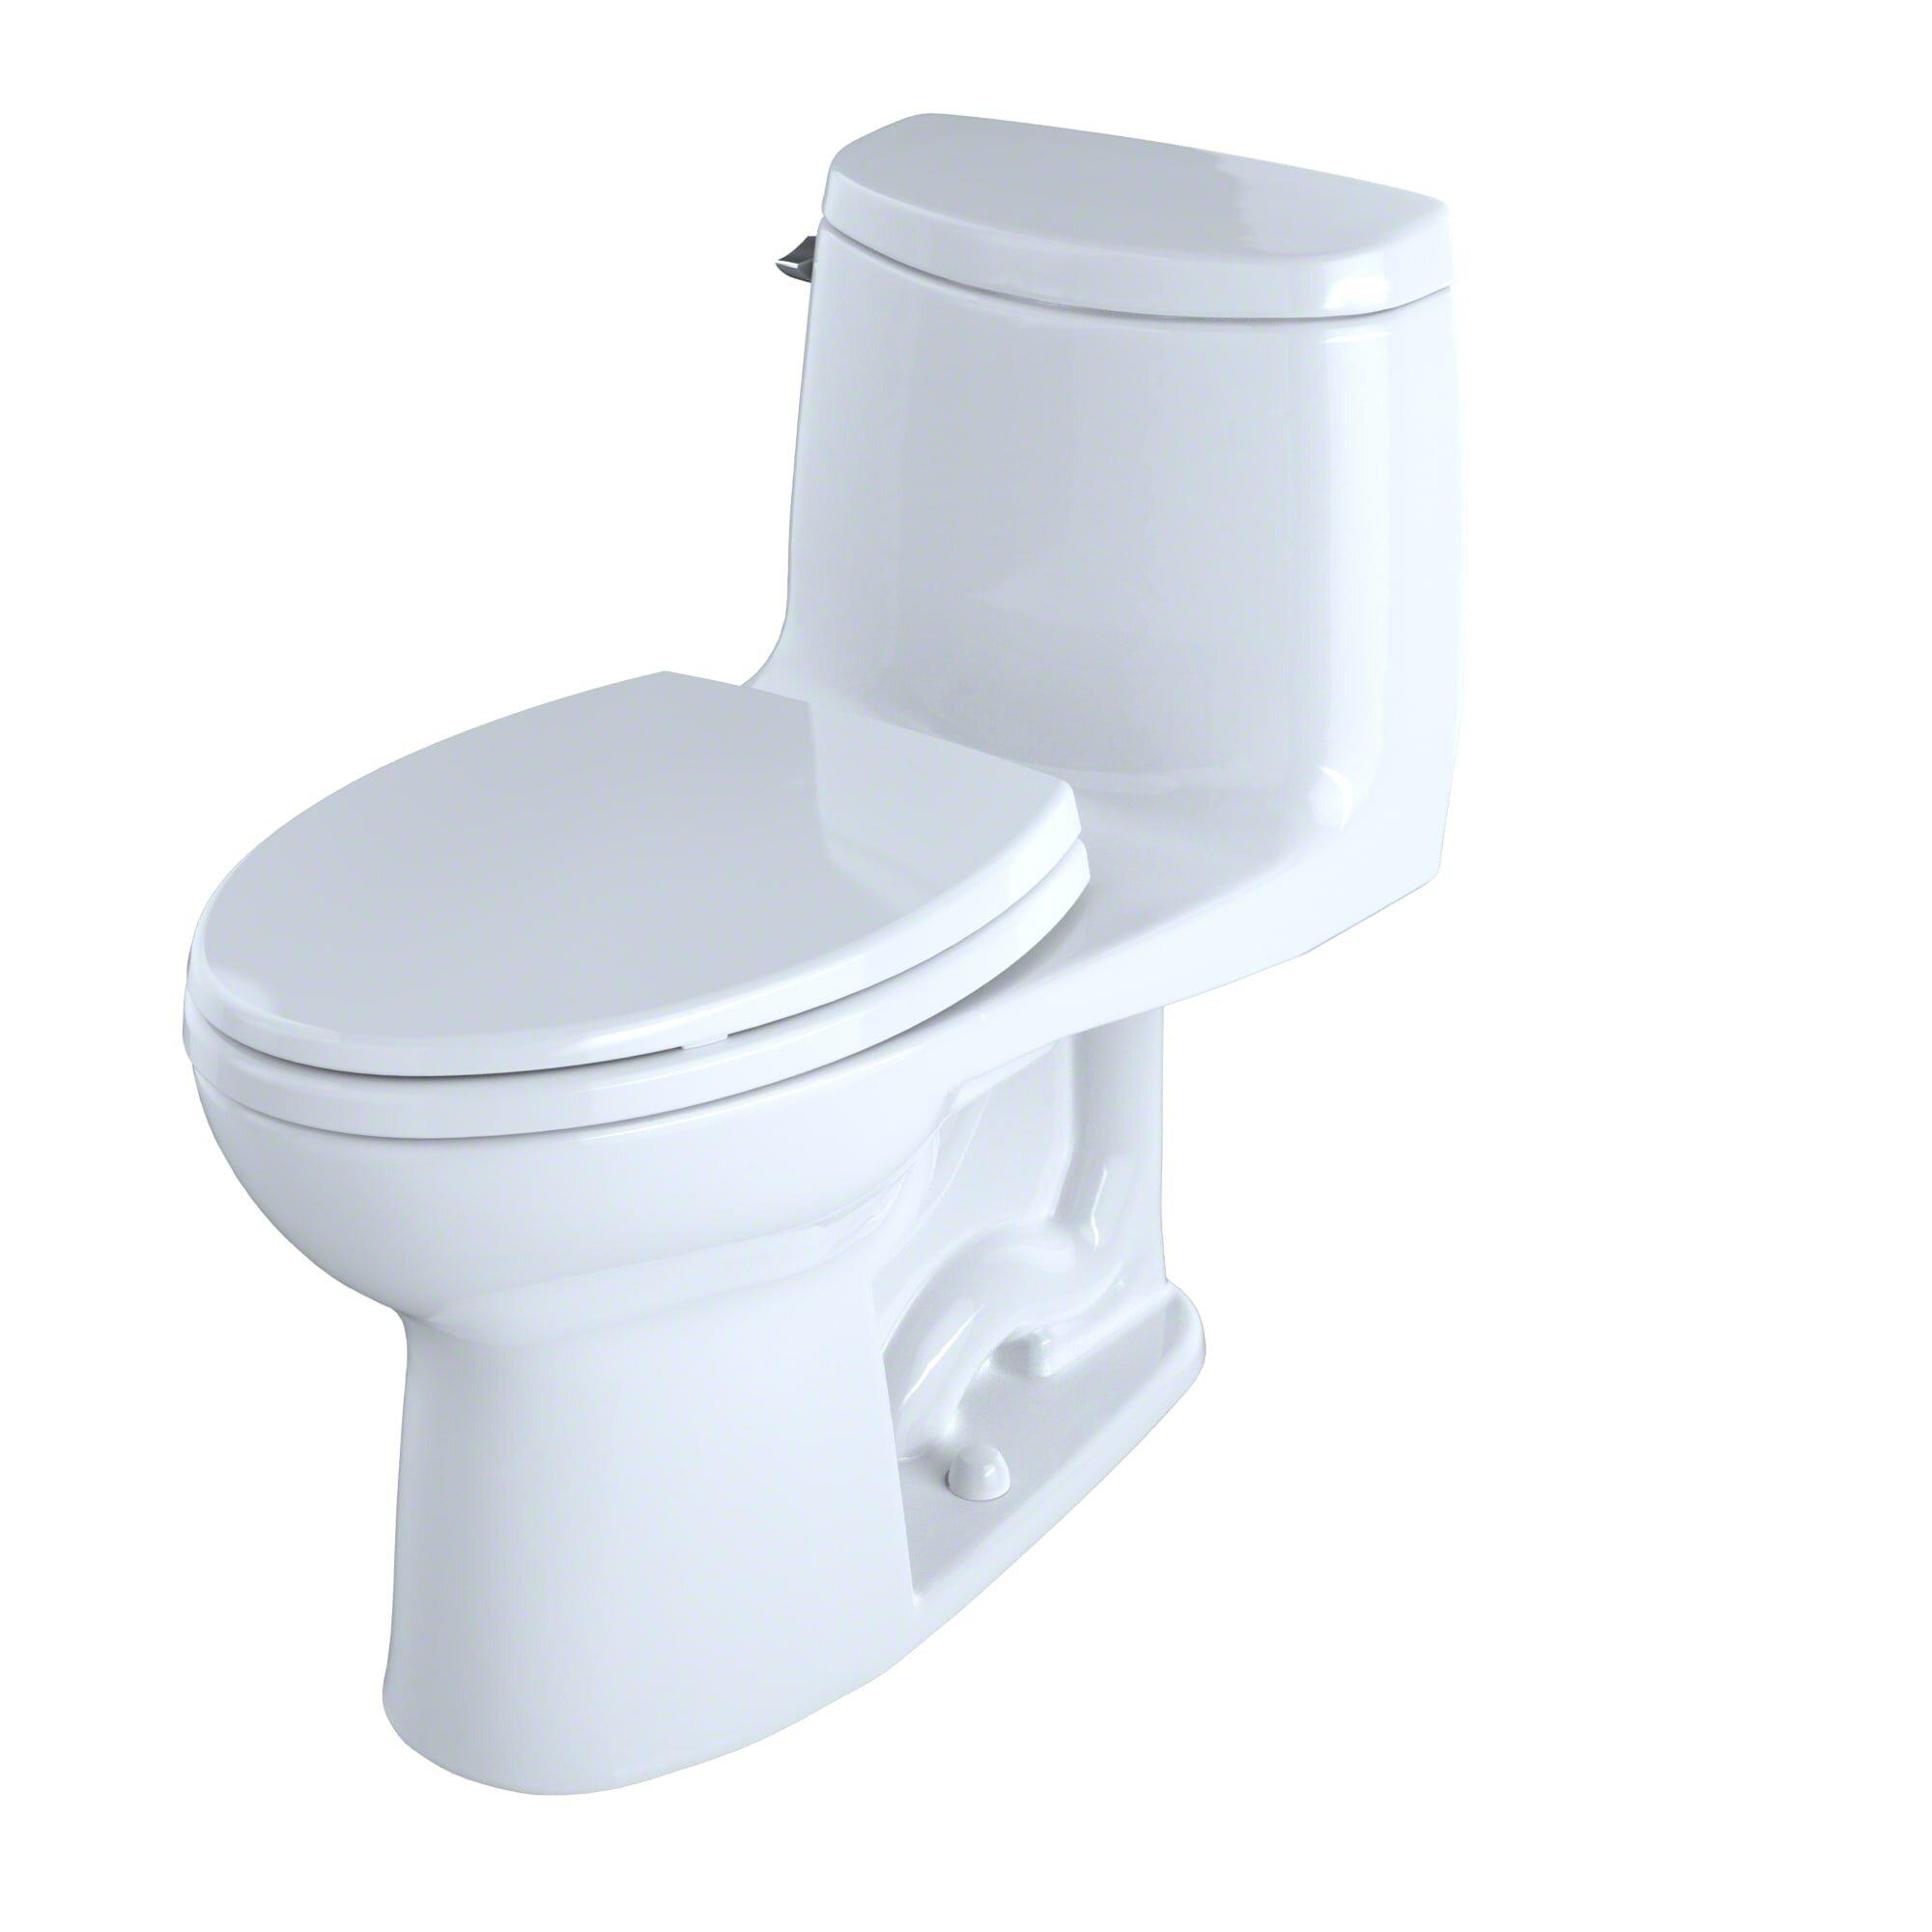 Toto Ultramax II 1.28 GPF Elongated One-Piece Toilet & Reviews | Wayfair